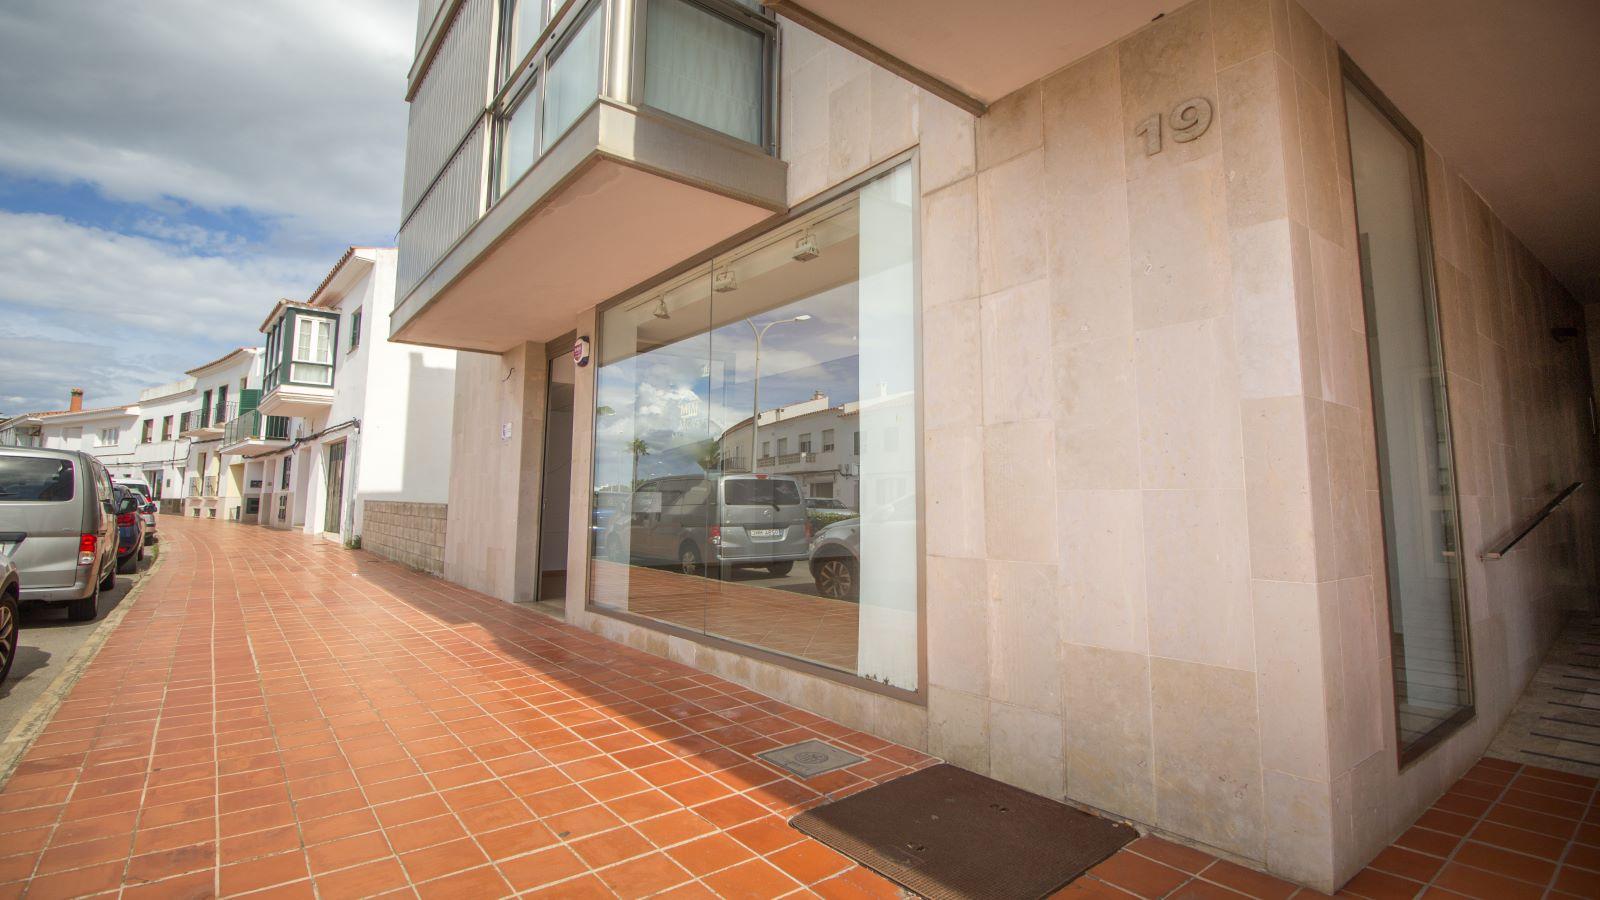 Local comercial en Sant Lluís Ref: S1715 8